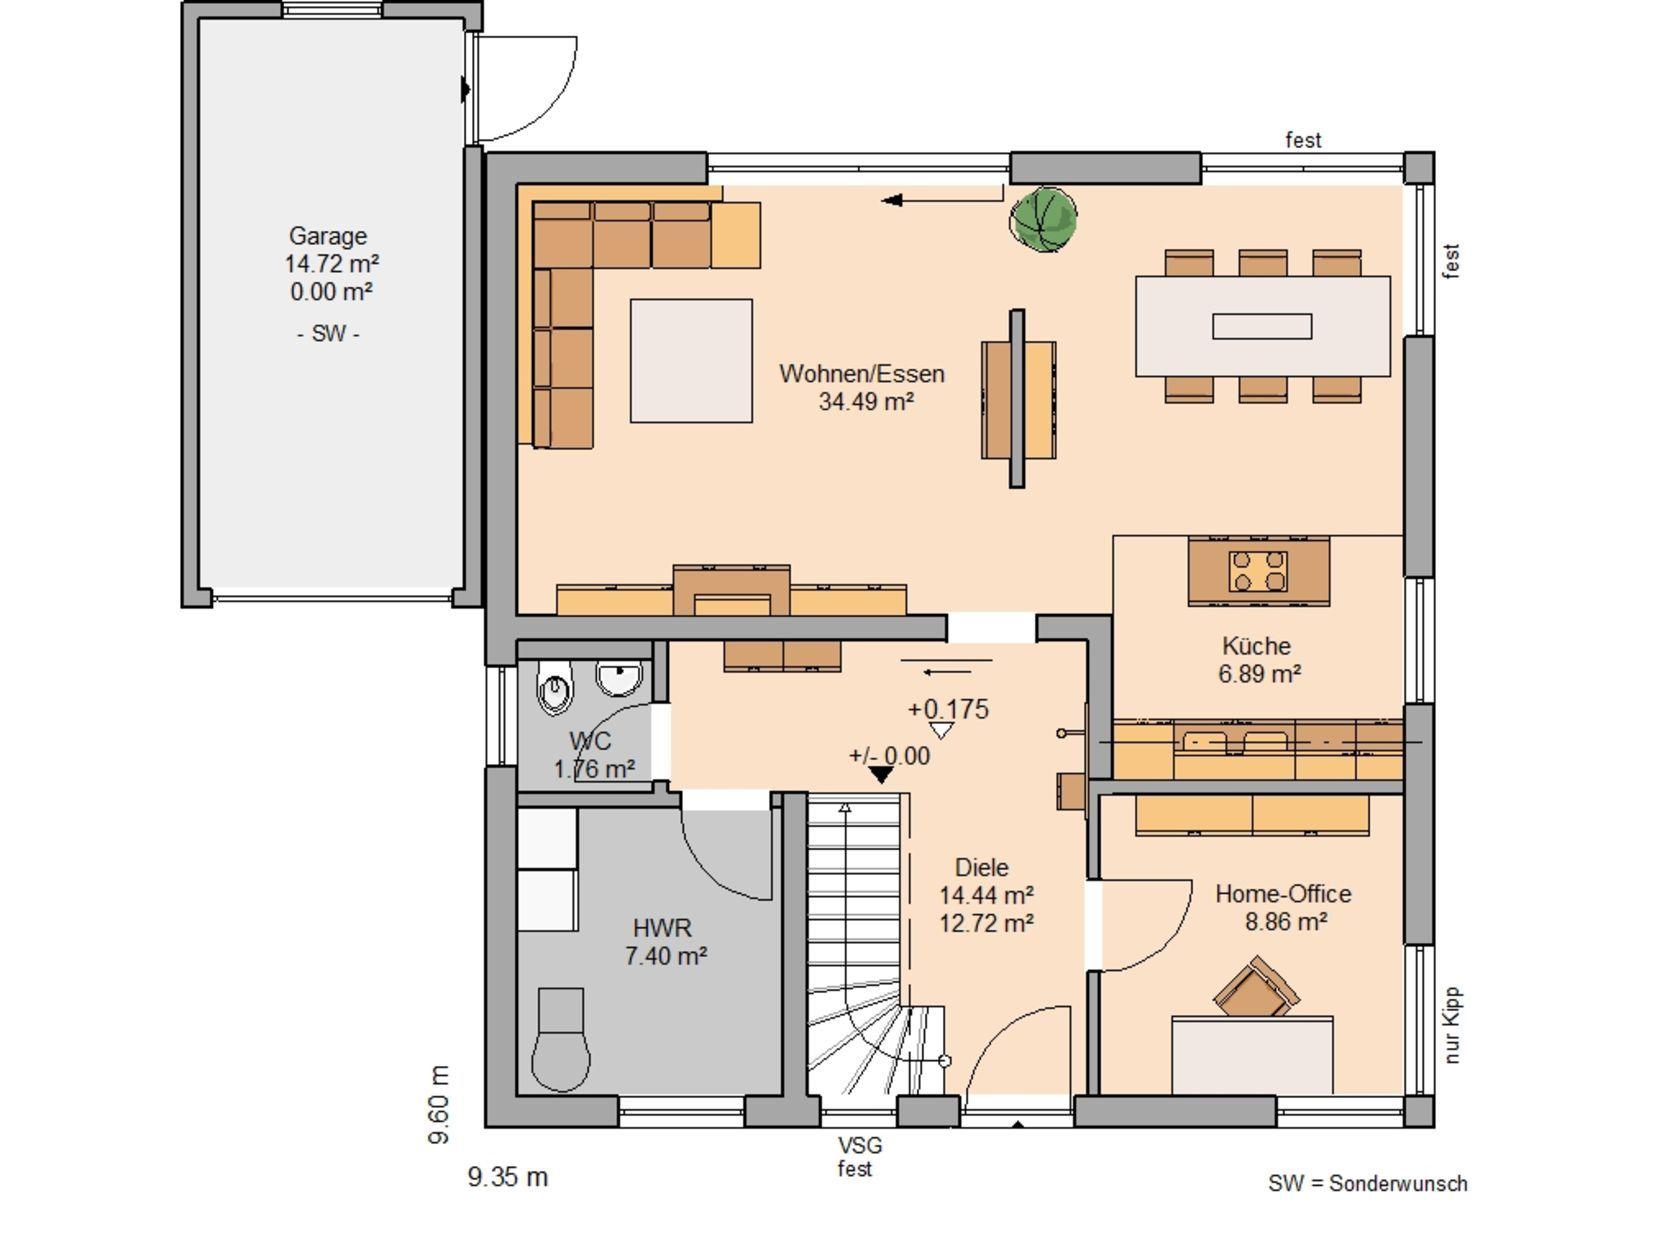 Grundriss villa mit garage  Kern-Haus Familienhaus Luna Plus Grundriss Erdgeschoss | Hausbau ...